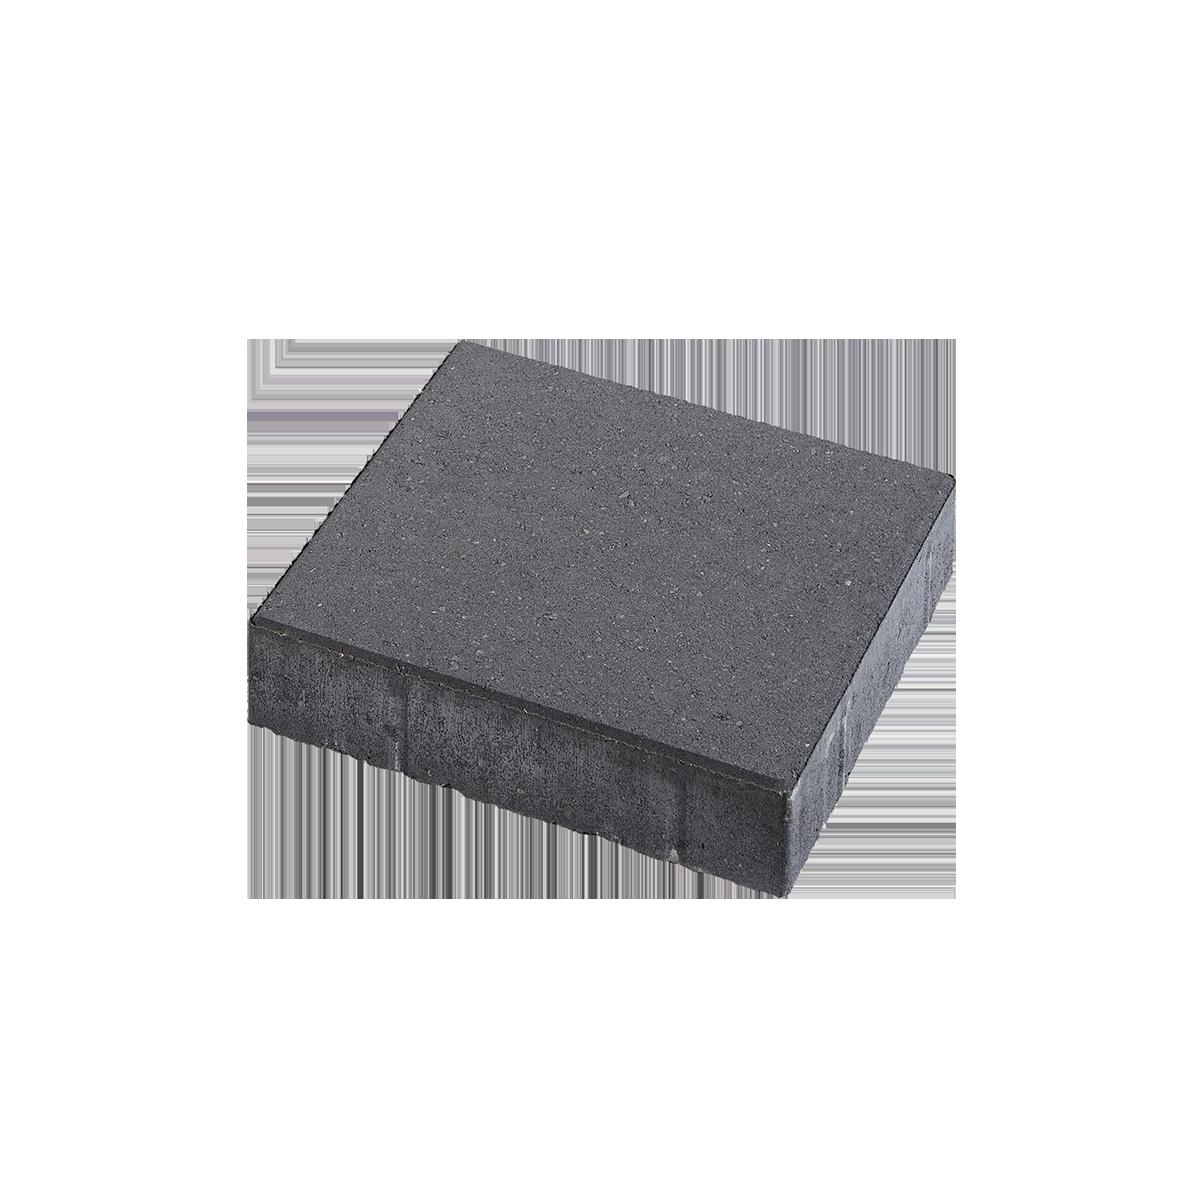 Fliser 30x30x8 cm Sort/Antracit